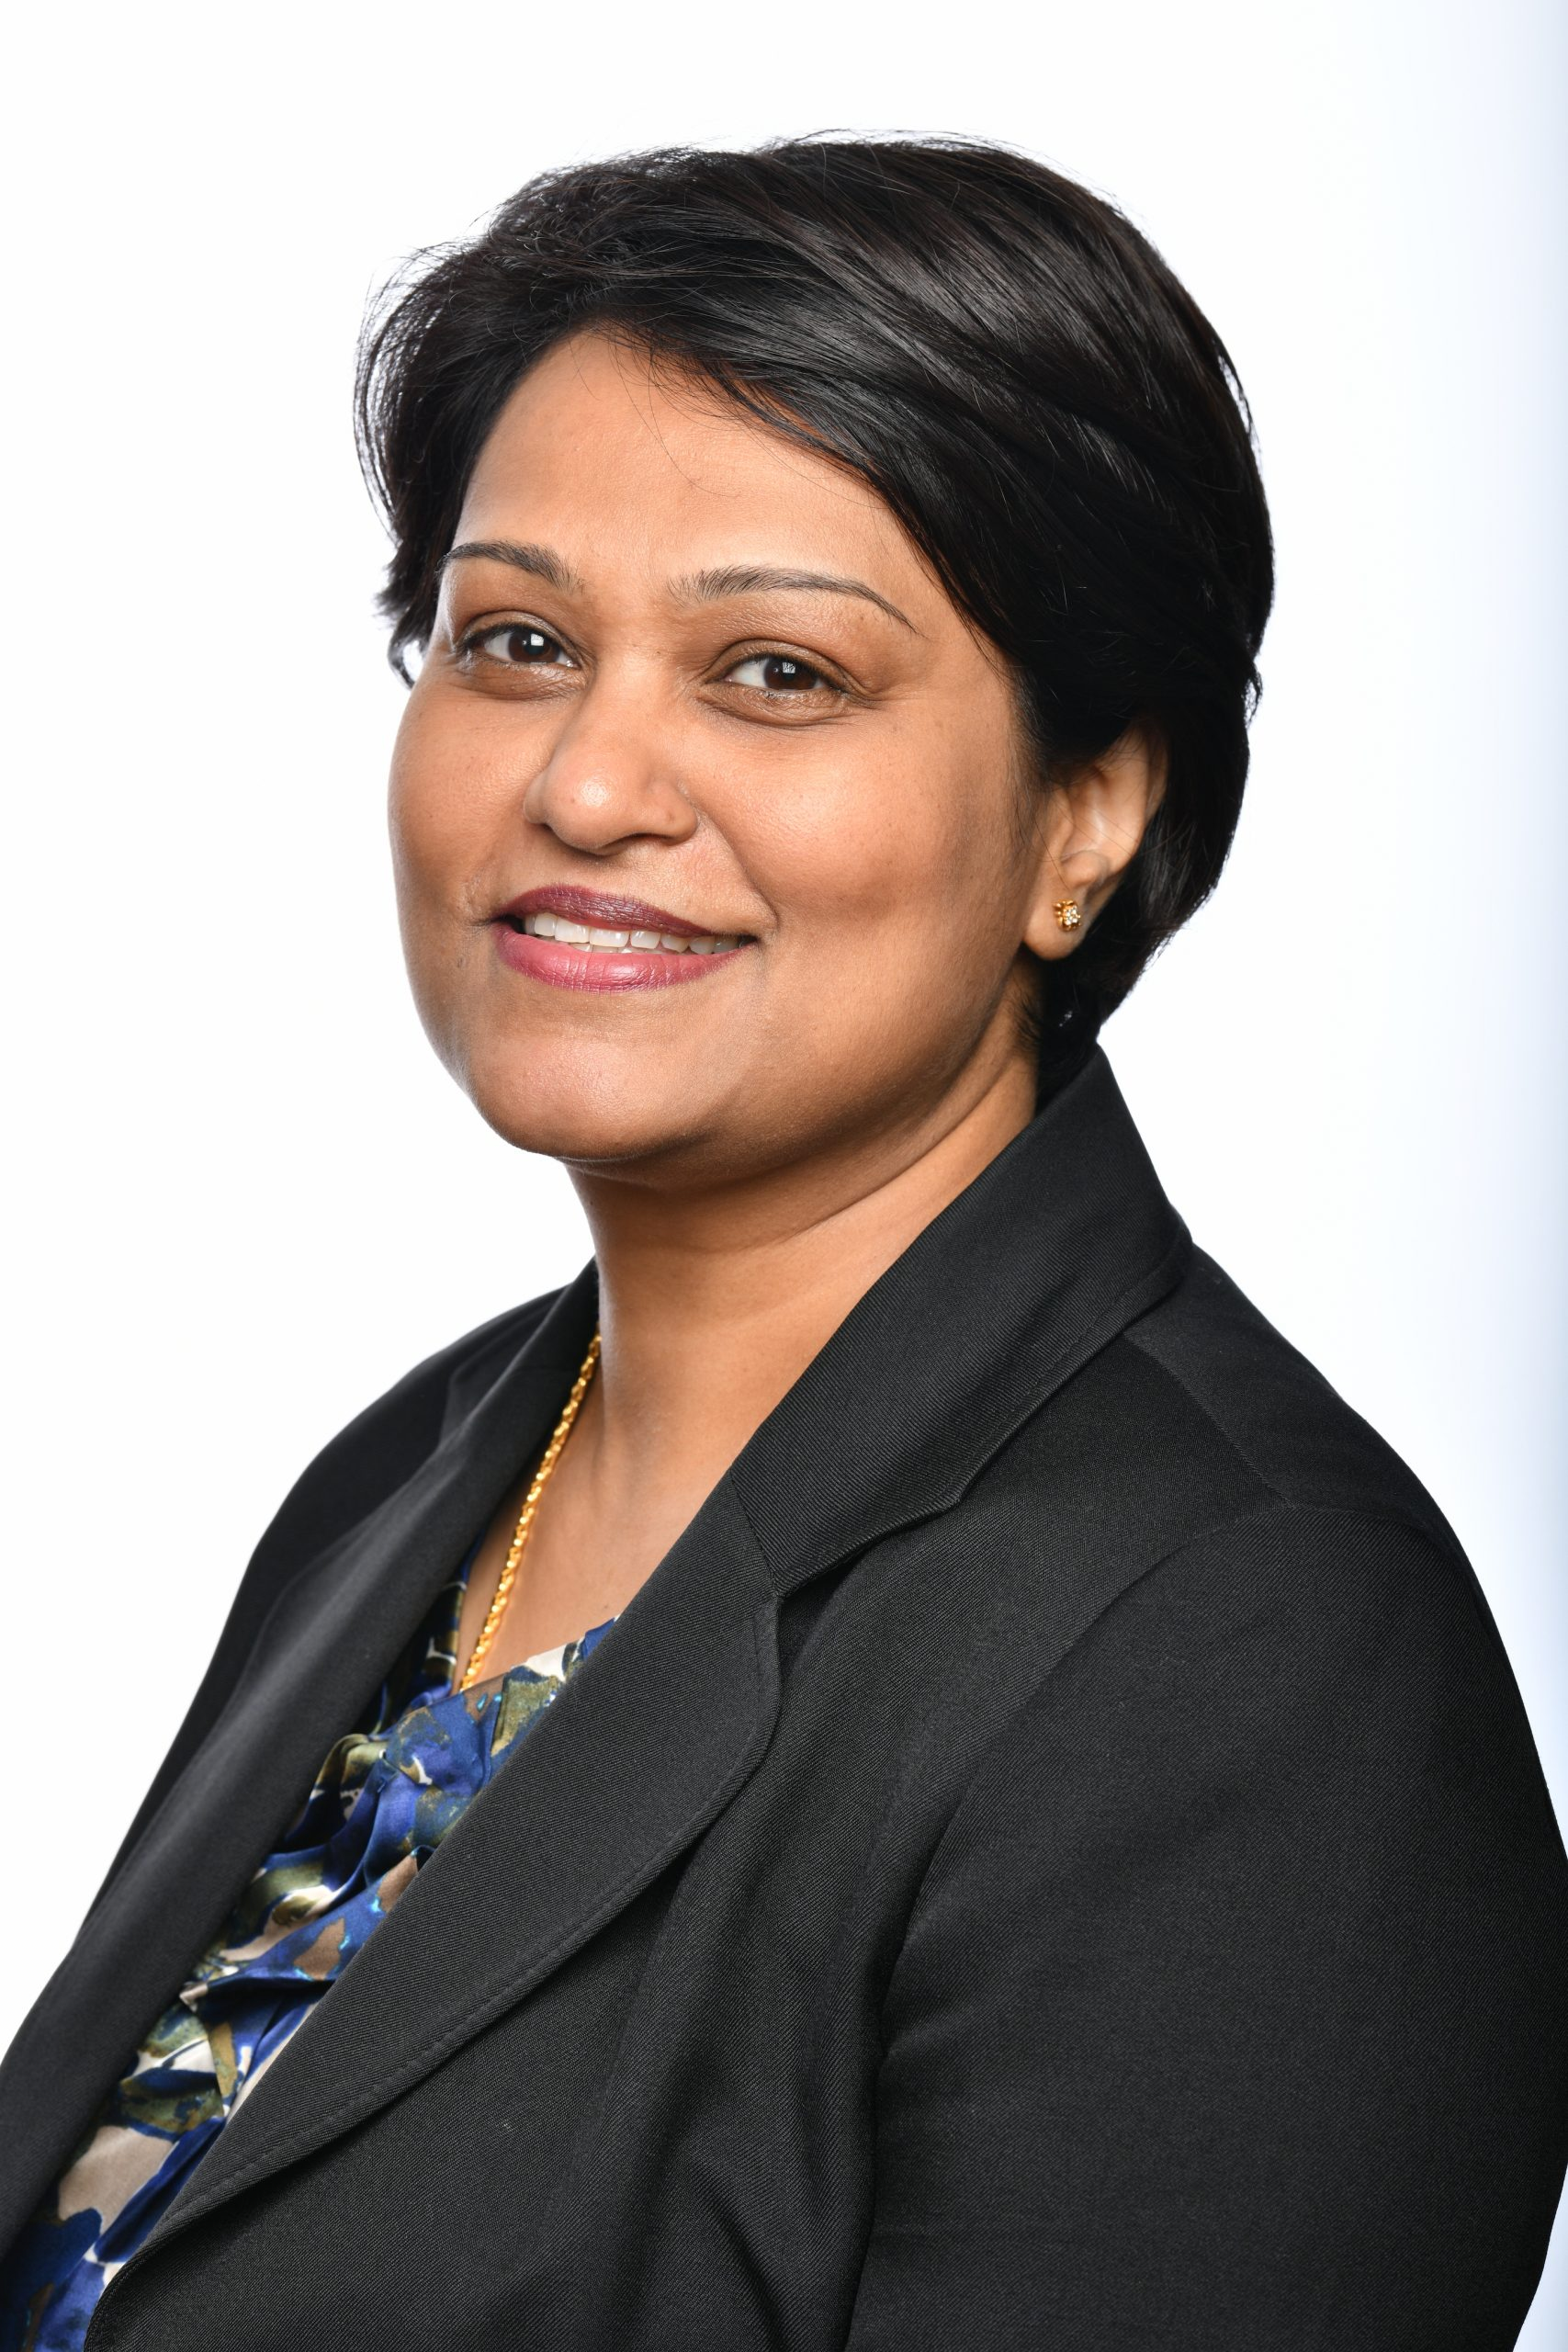 Yotsna Lalji Venketasawmy